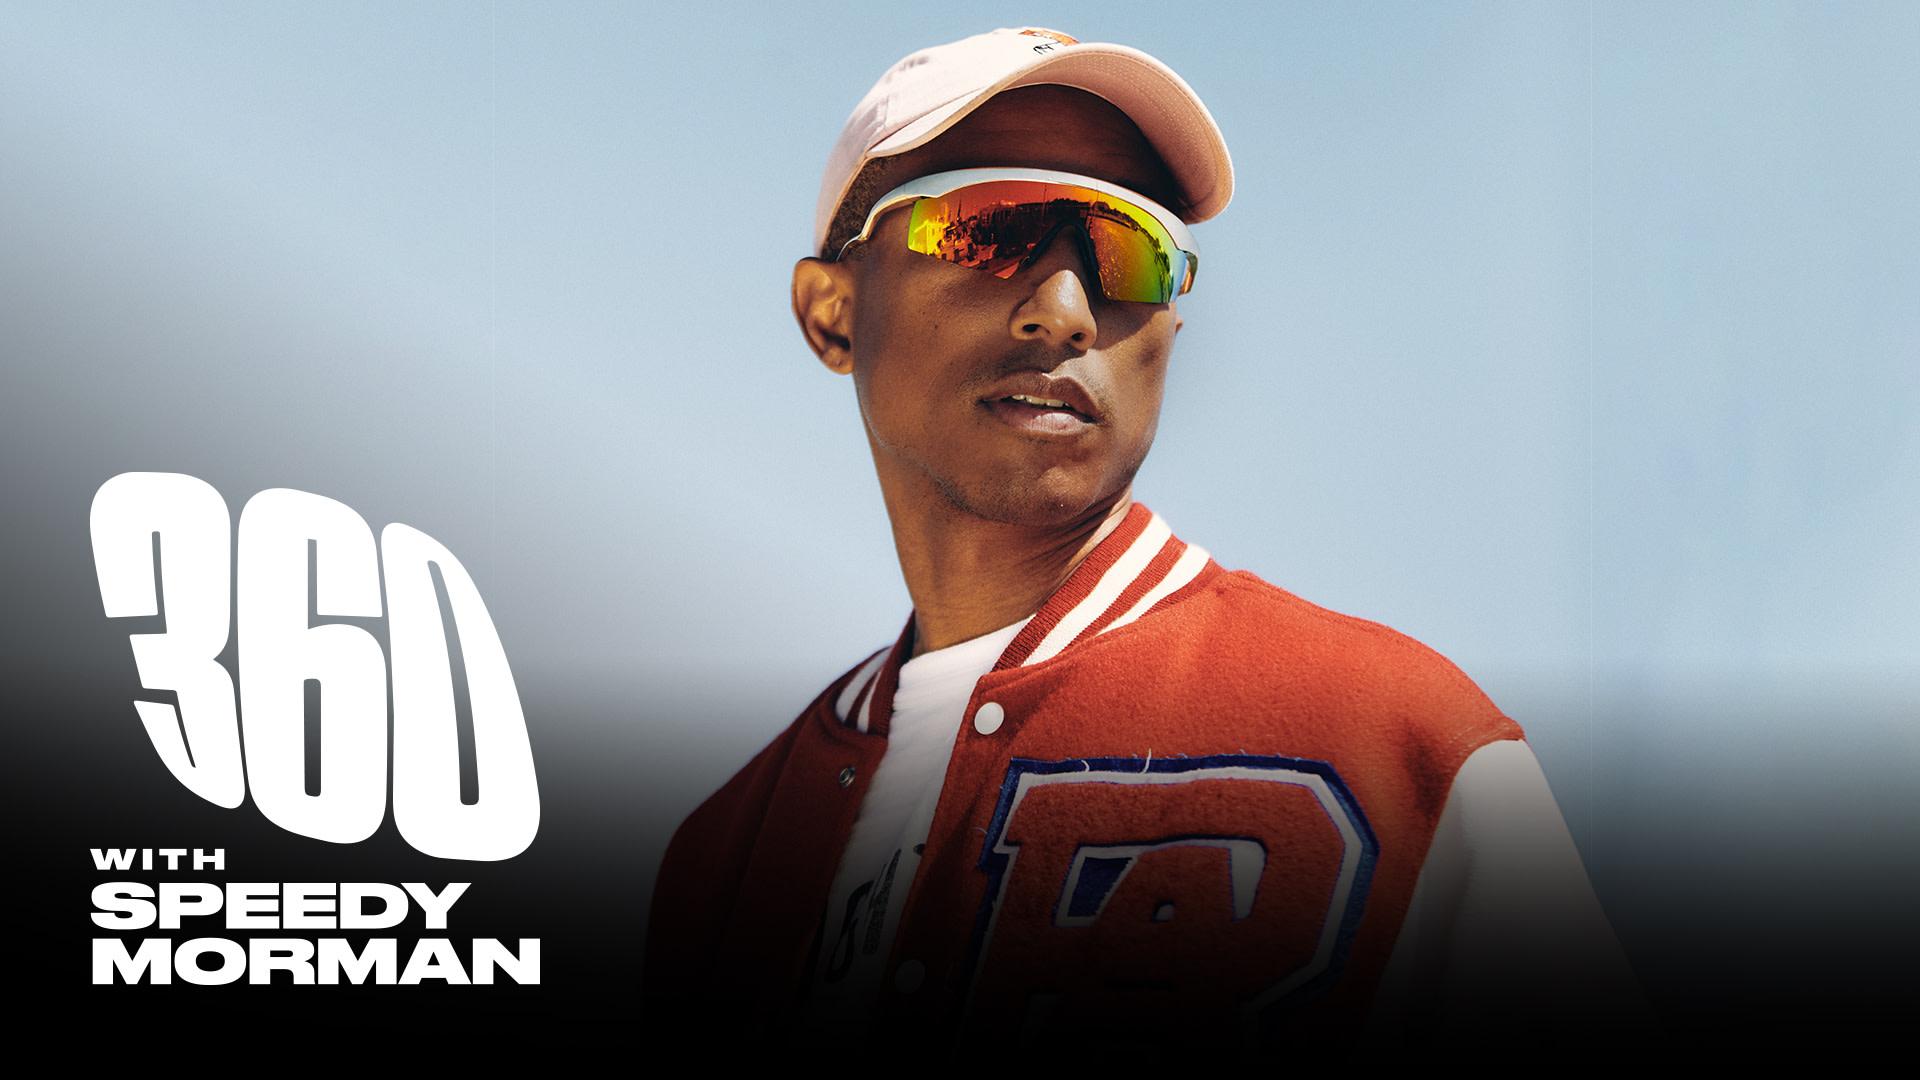 Pharrell Teases Rihanna Album, Lists Songs That Represent Him | 360 with Speedy Morman